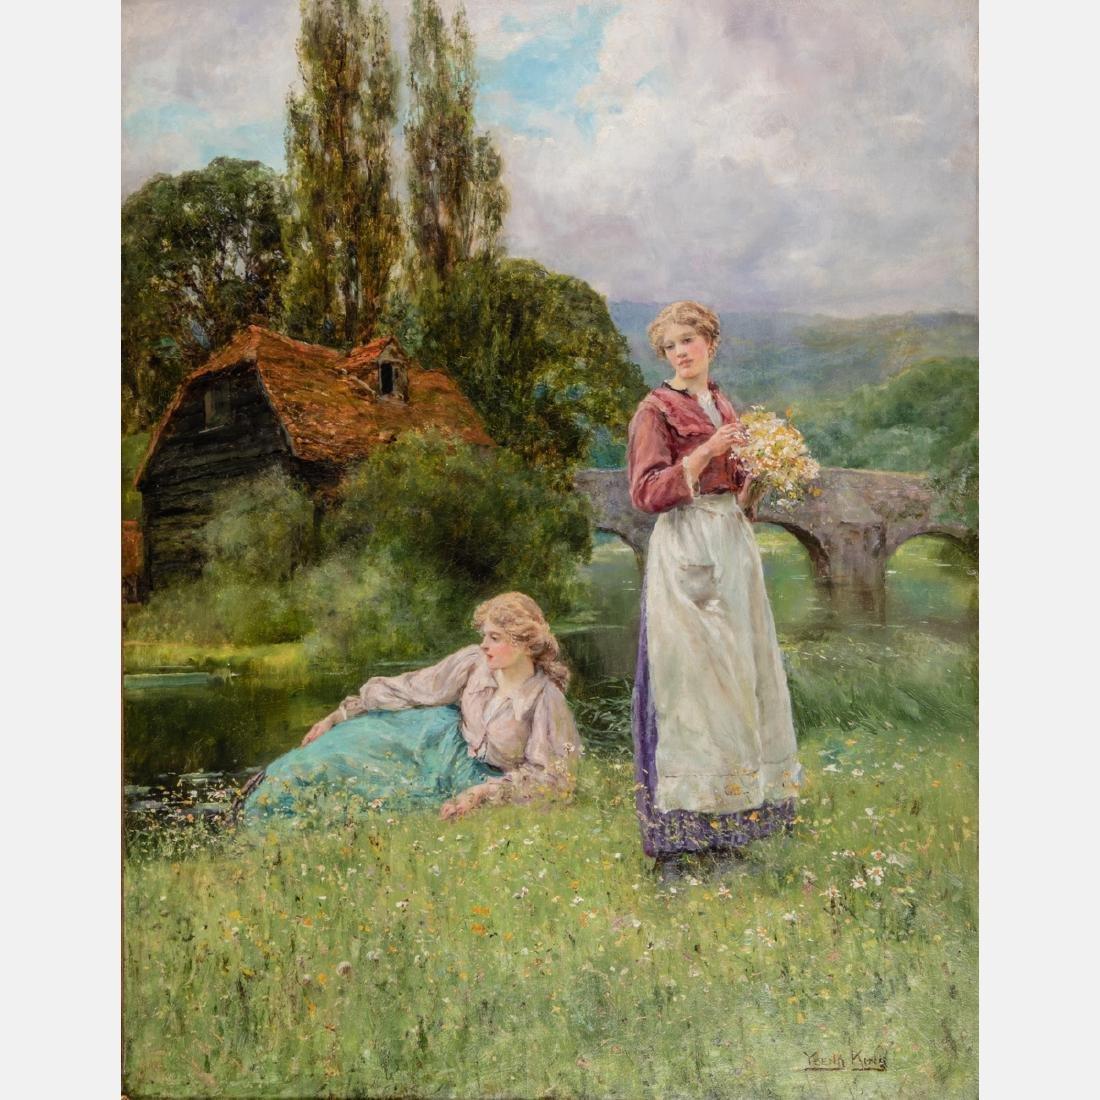 Henry John Yeend King (British, 1855-1924) Two Ladies